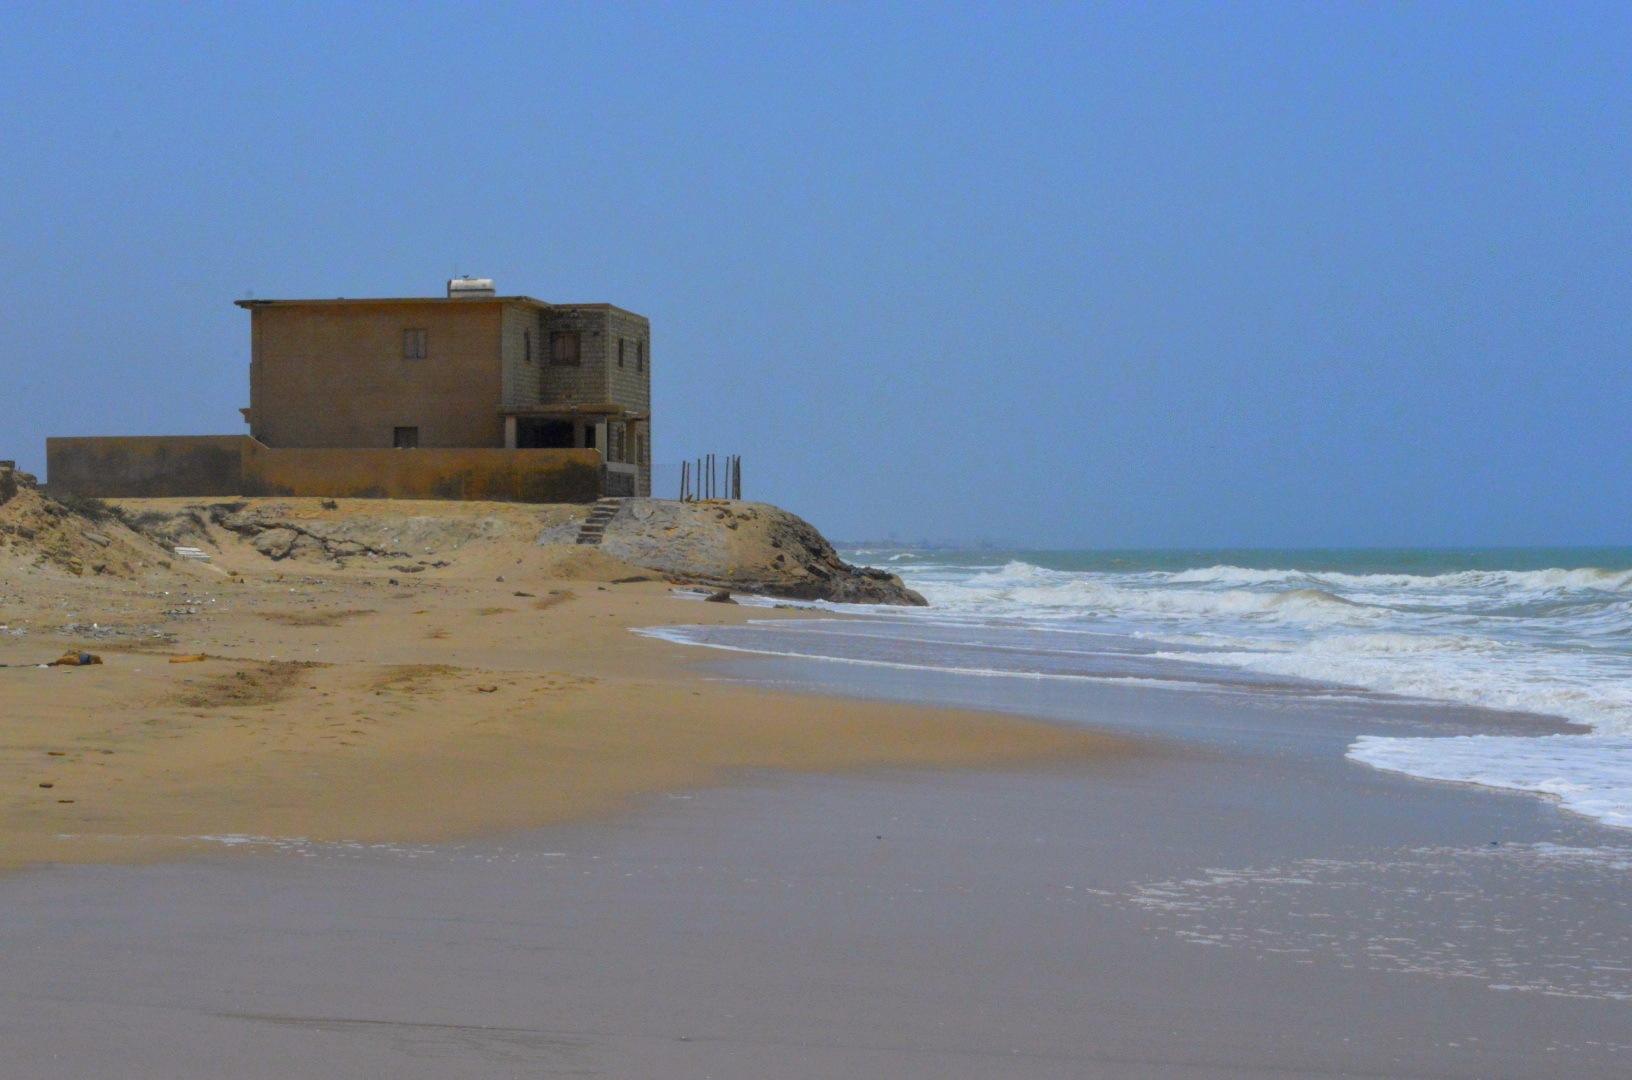 Silent beach by Shumaila Khatri